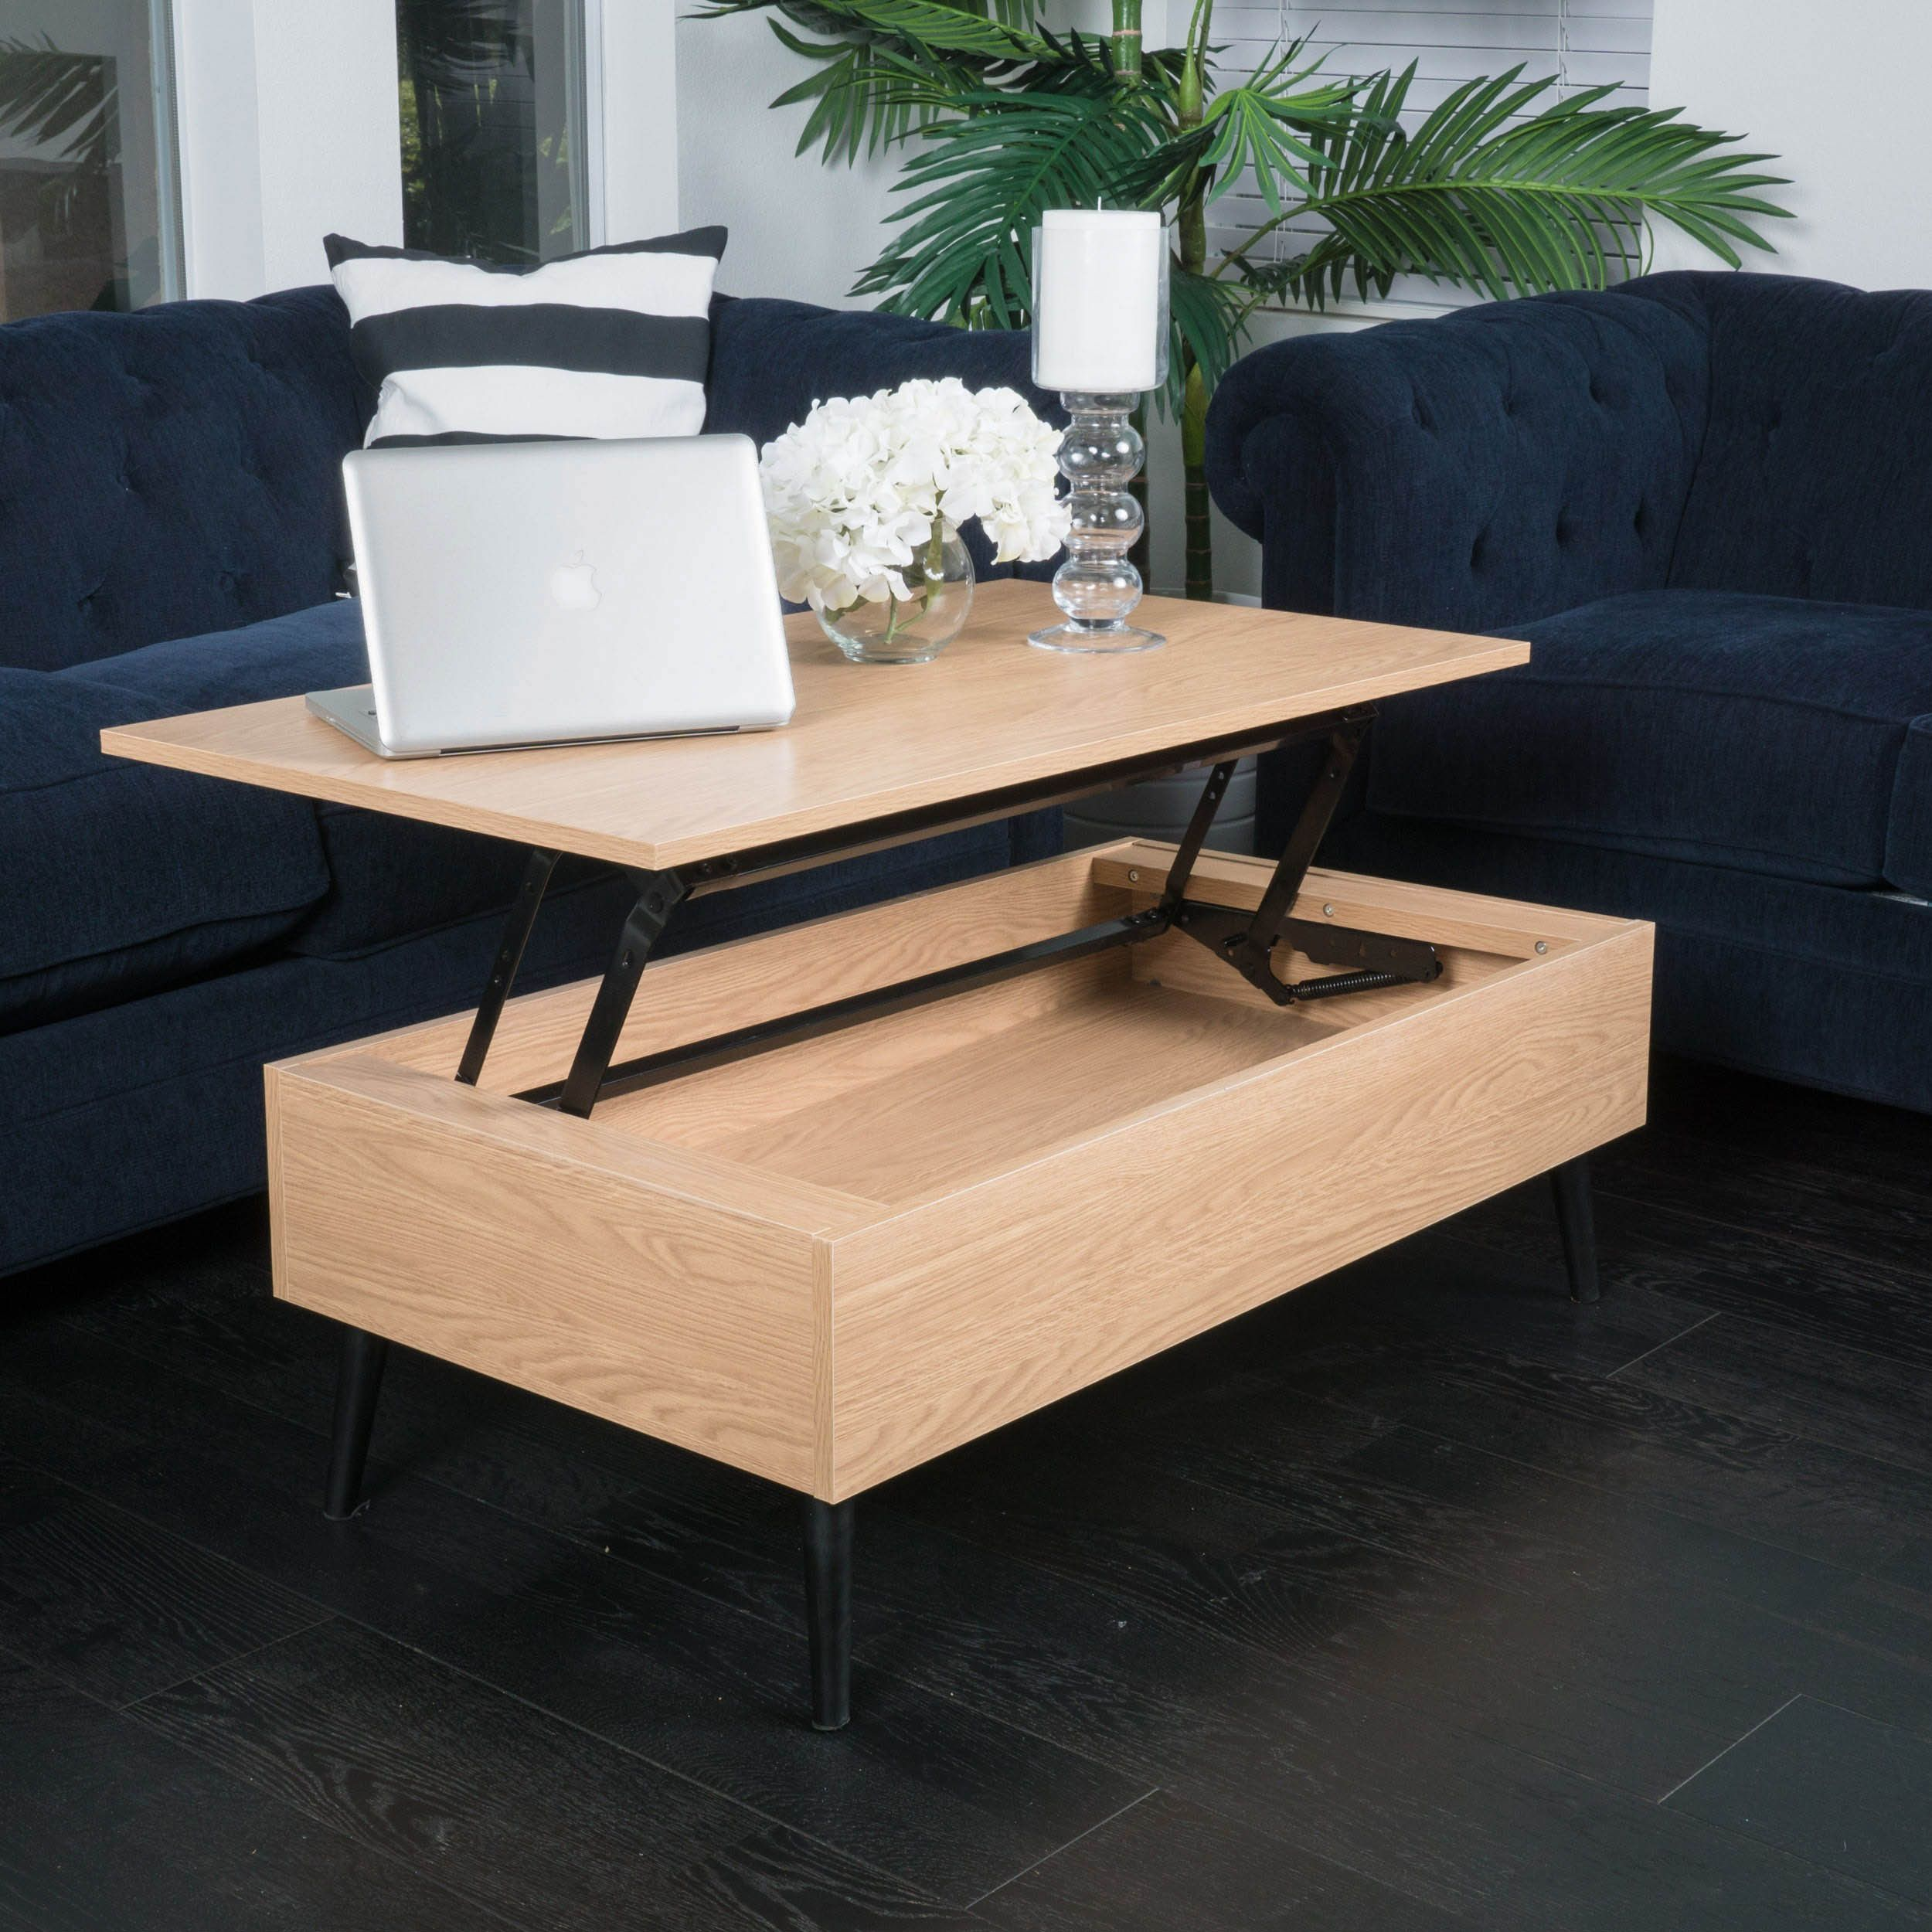 Storage Table | My Store-Y Self Storage Woodlands